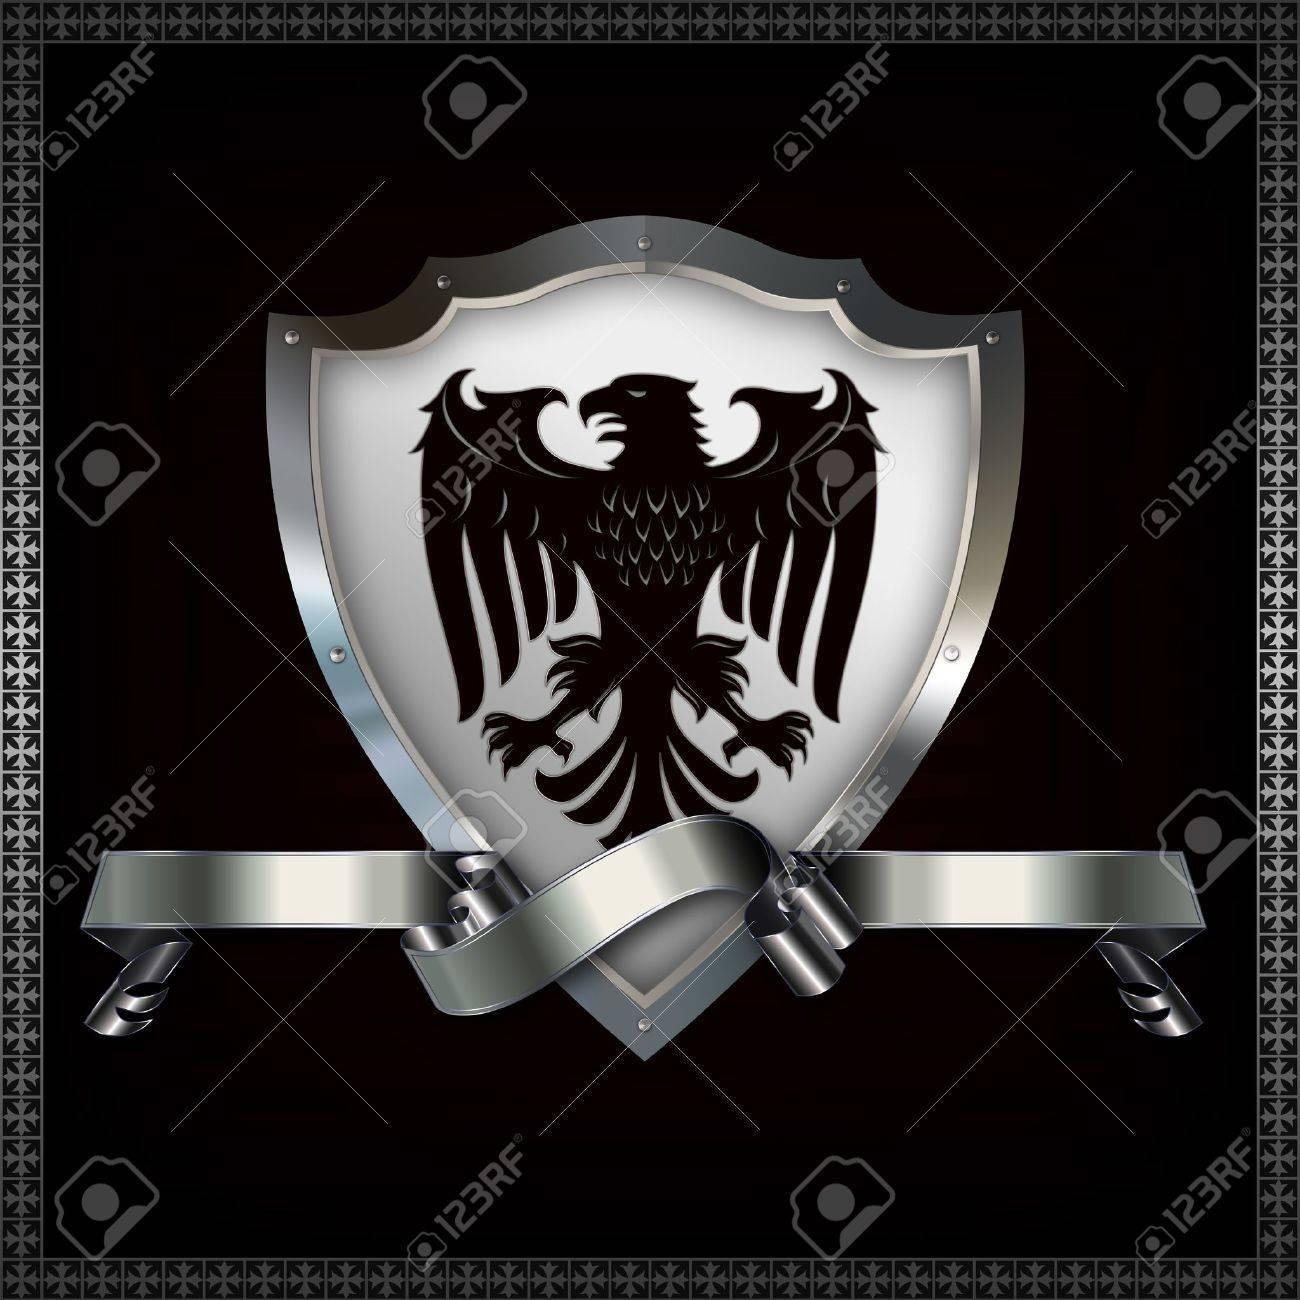 Heraldic shield with image of heraldic eagle and decorative ribbon Stock Photo - 14463507